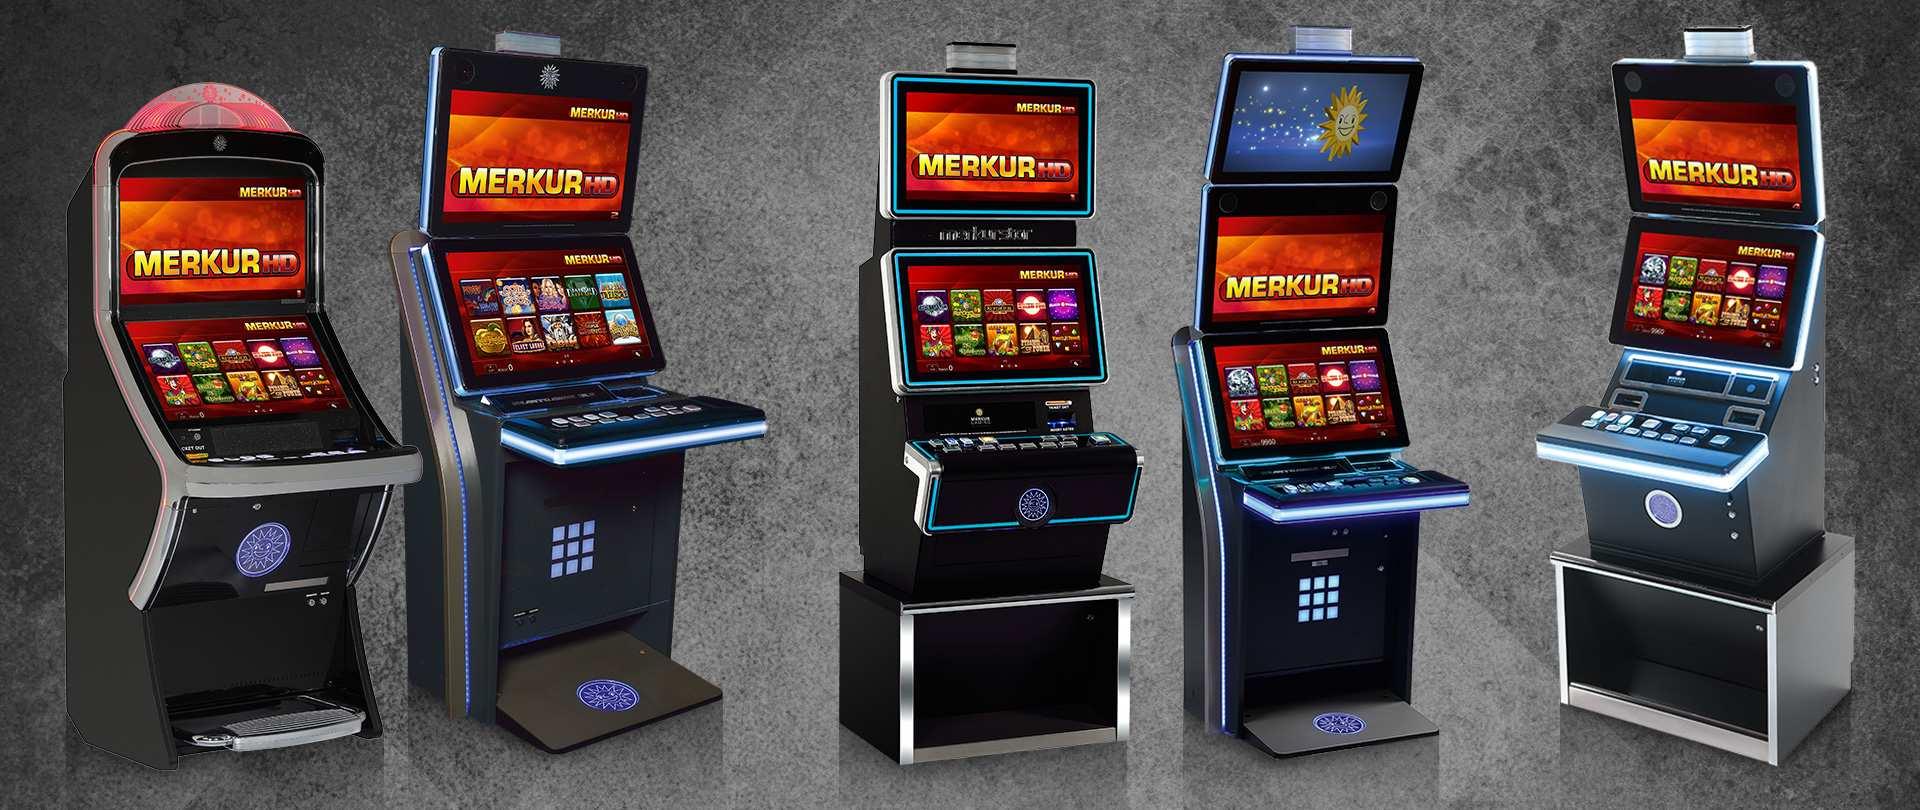 Merkur Spiele Liste 358942